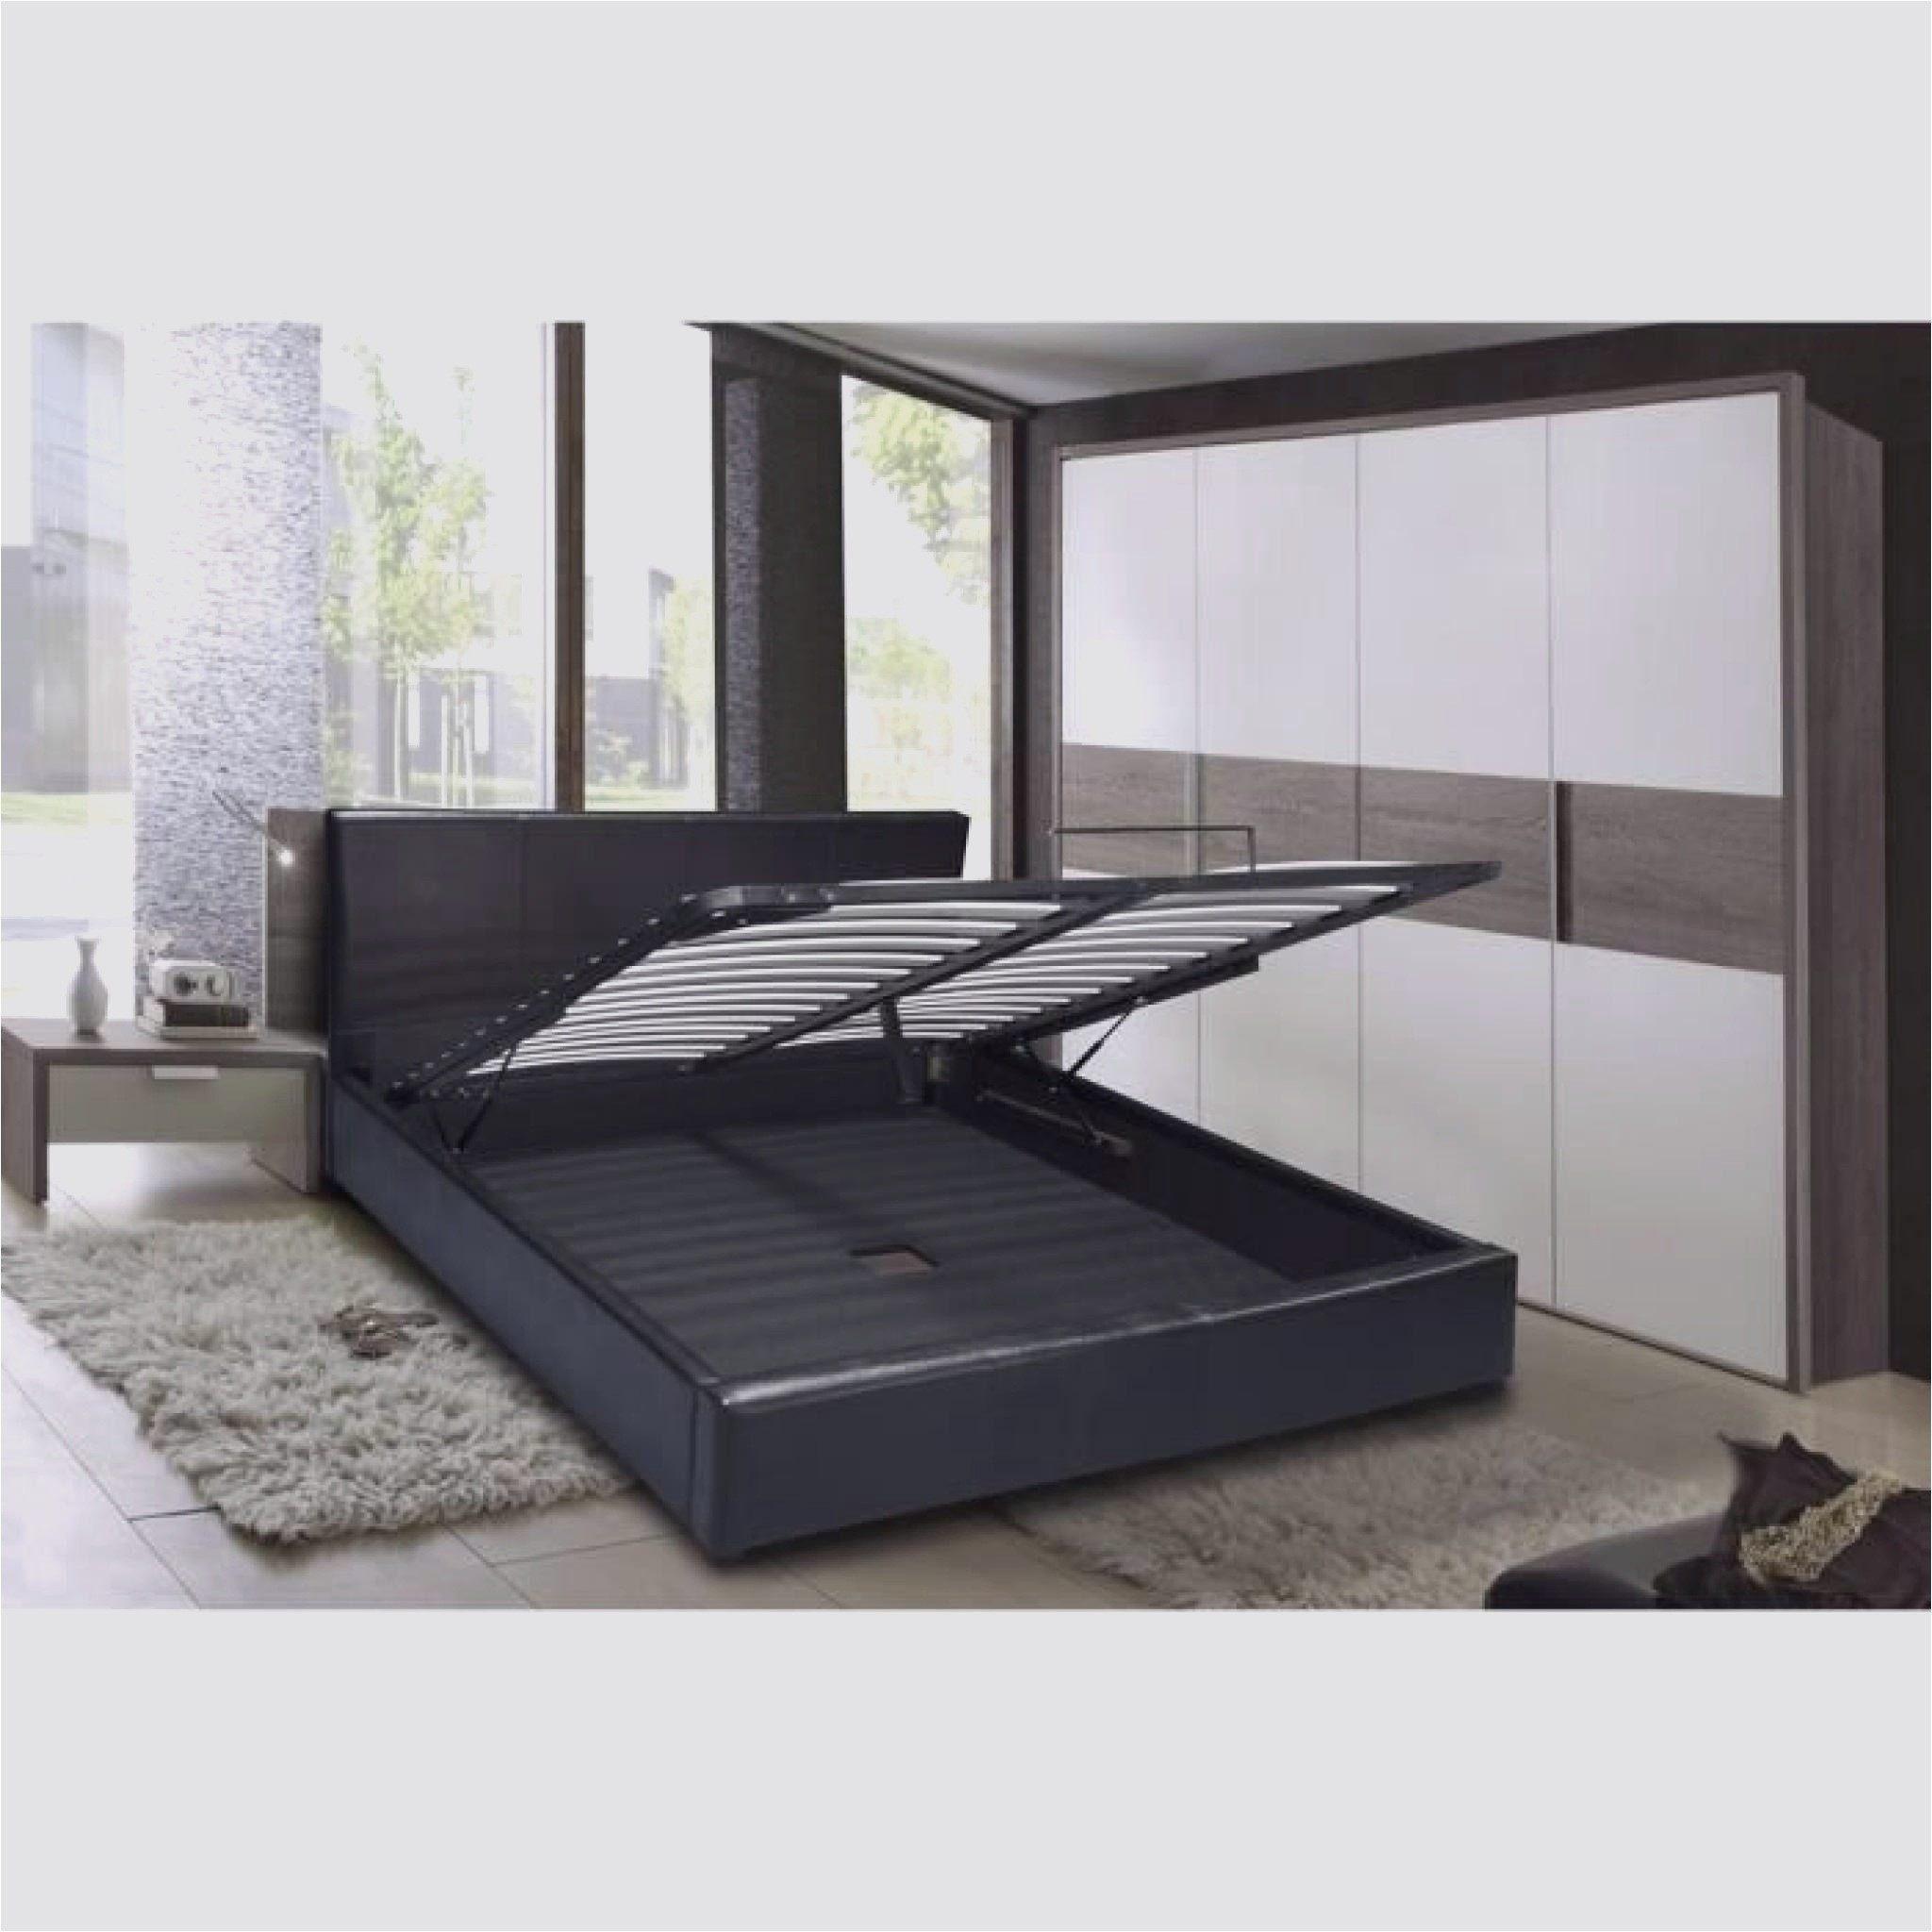 Ikea Lit Coffre 160 De Luxe Lit 80 190 Lit Coffre 90—190 Conforama Rare Tiroir De Lit Conforama